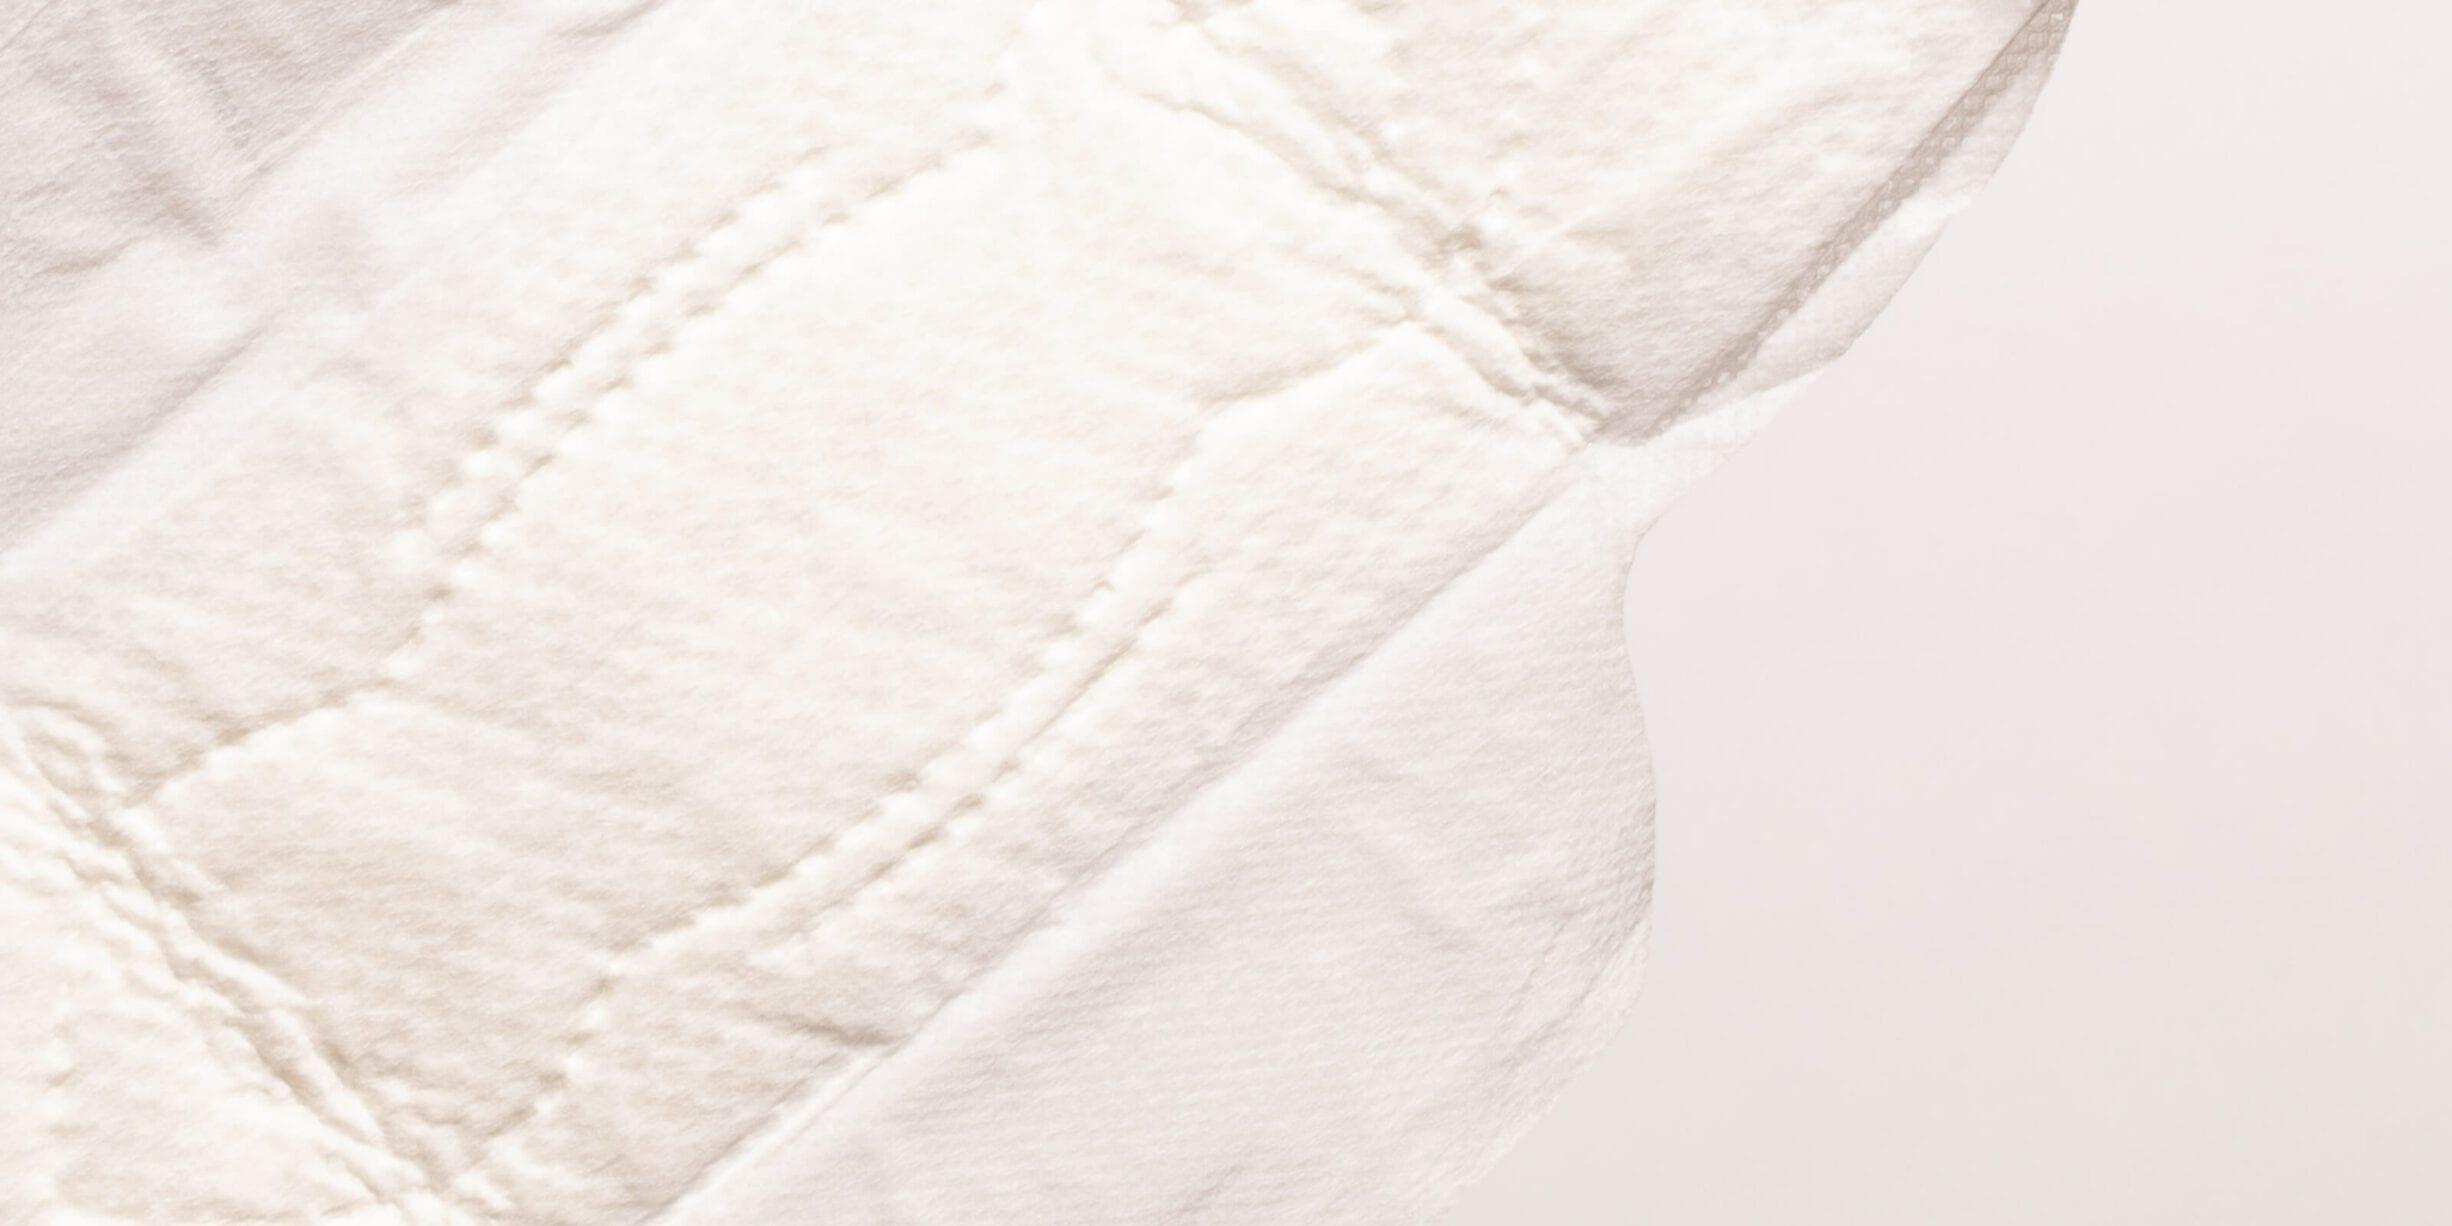 menstrual pad